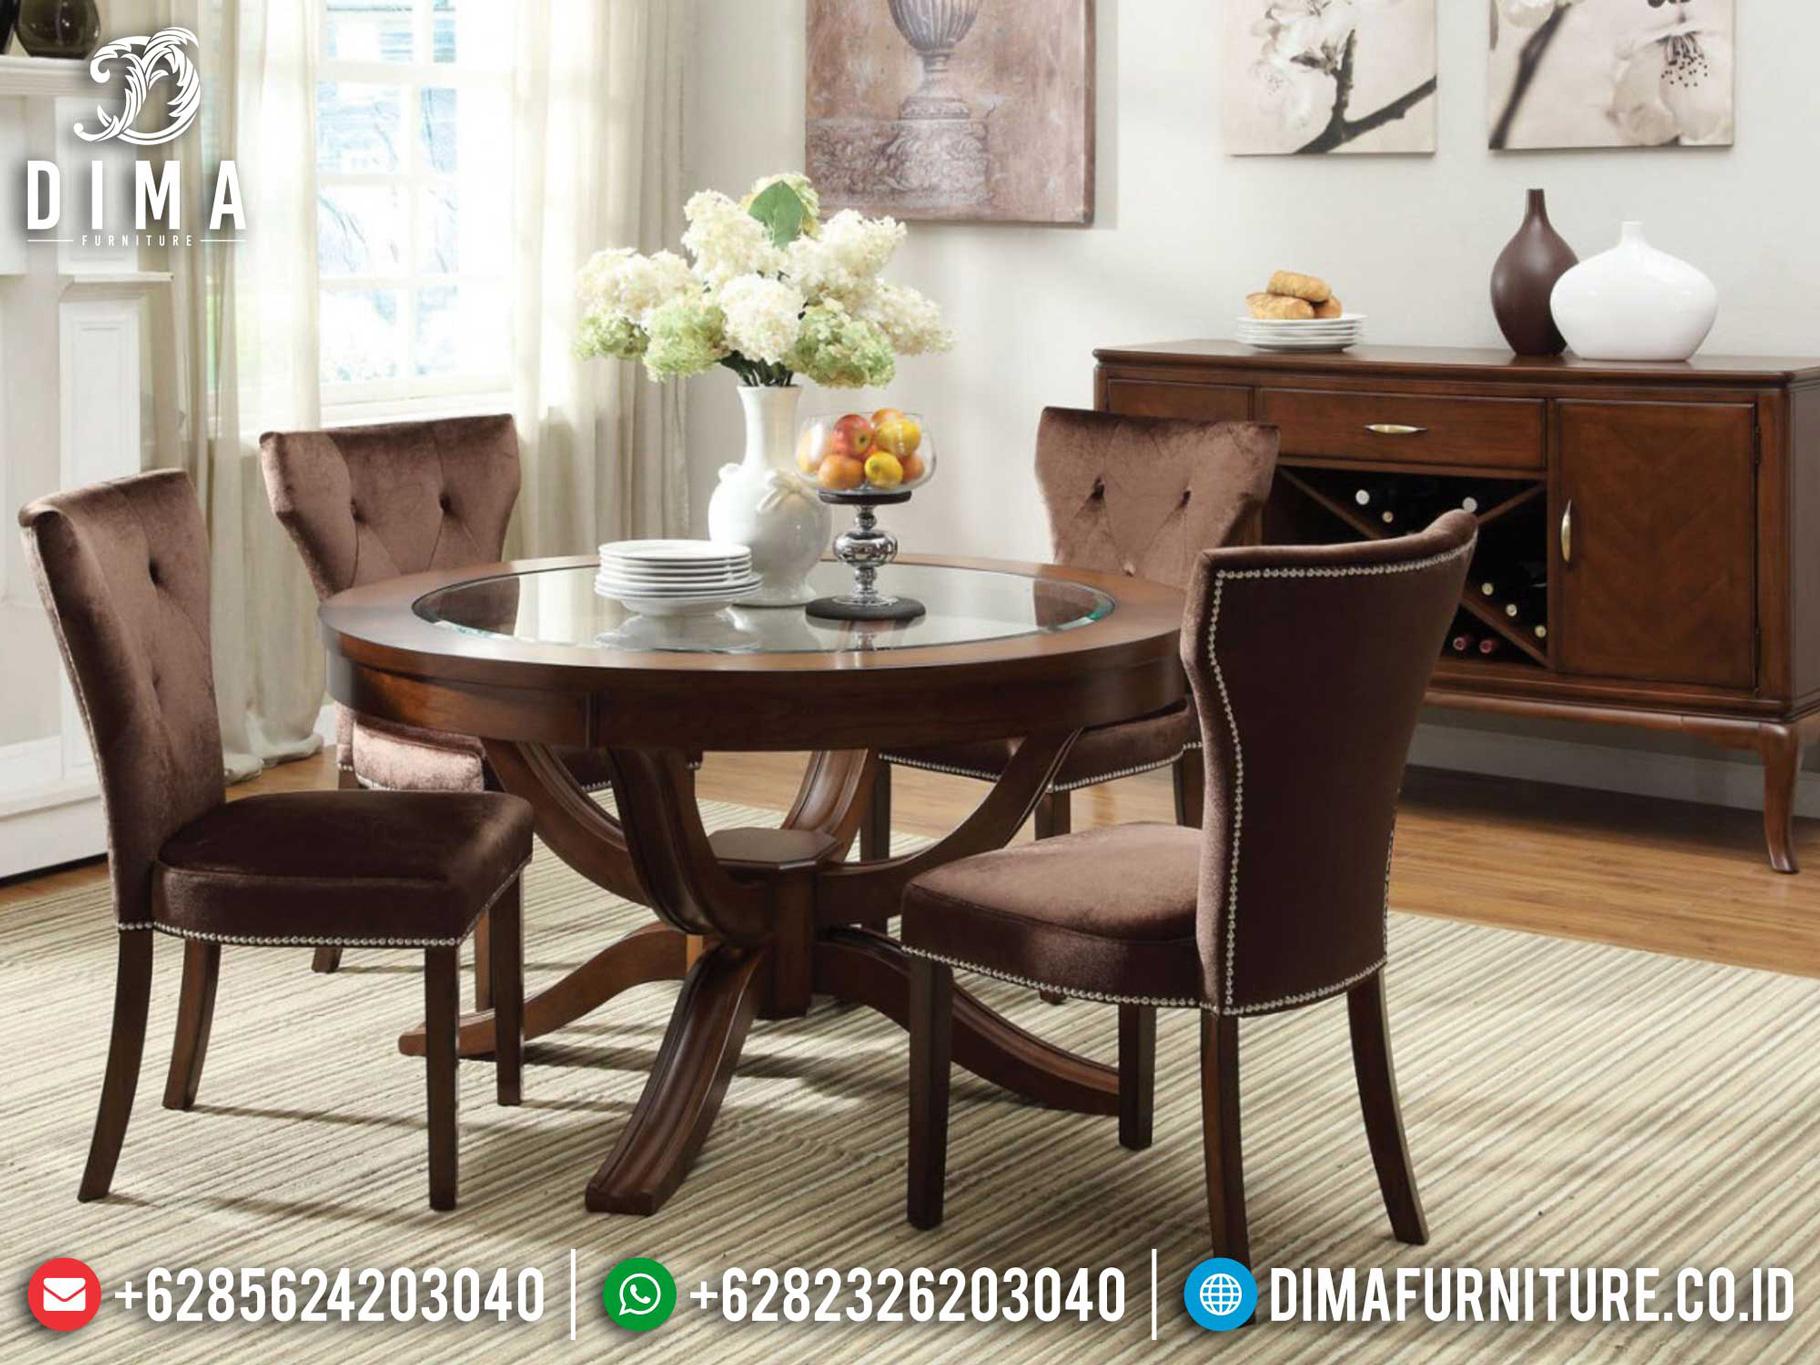 Meja Makan Mewah Jati Classic Luxury Simple Elegant Model Mm-1022